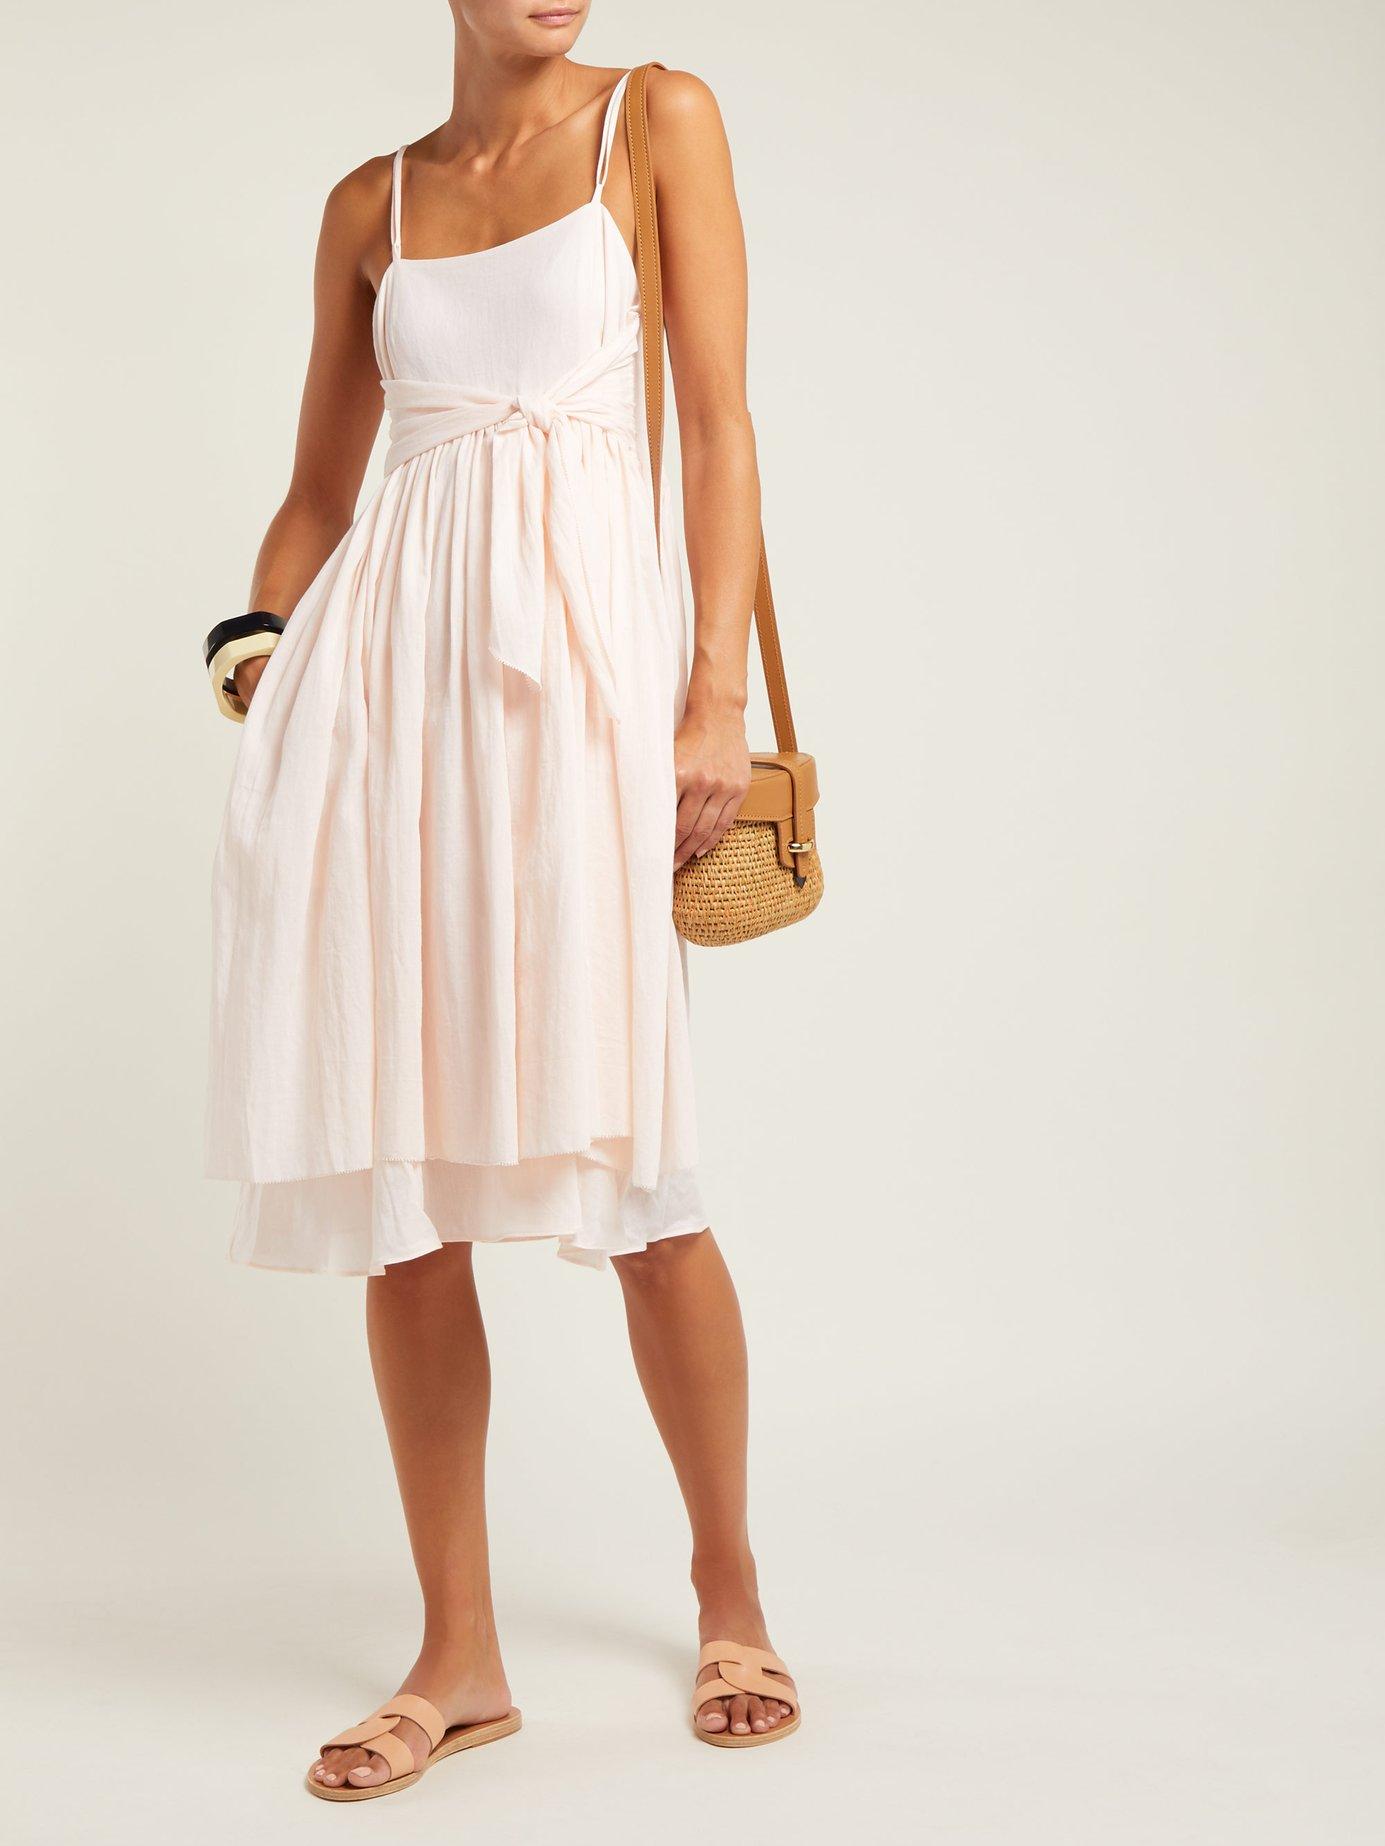 Lily layered cotton dress by Loup Charmant